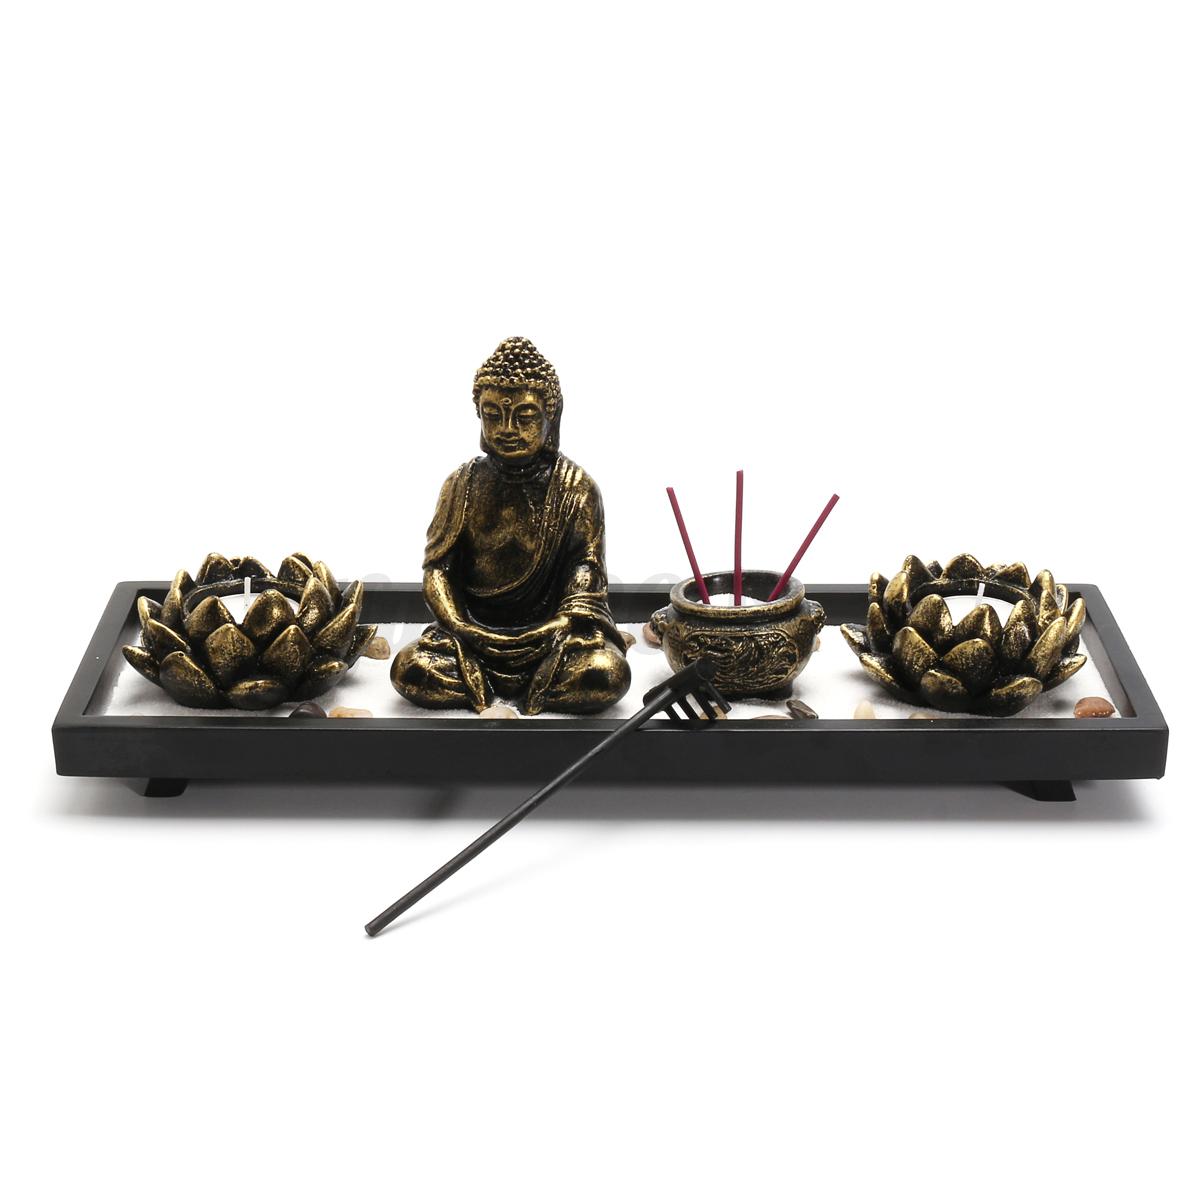 deko set zen garten buddha sand felsen r ucherst bchen rake feng shui dekoration ebay. Black Bedroom Furniture Sets. Home Design Ideas